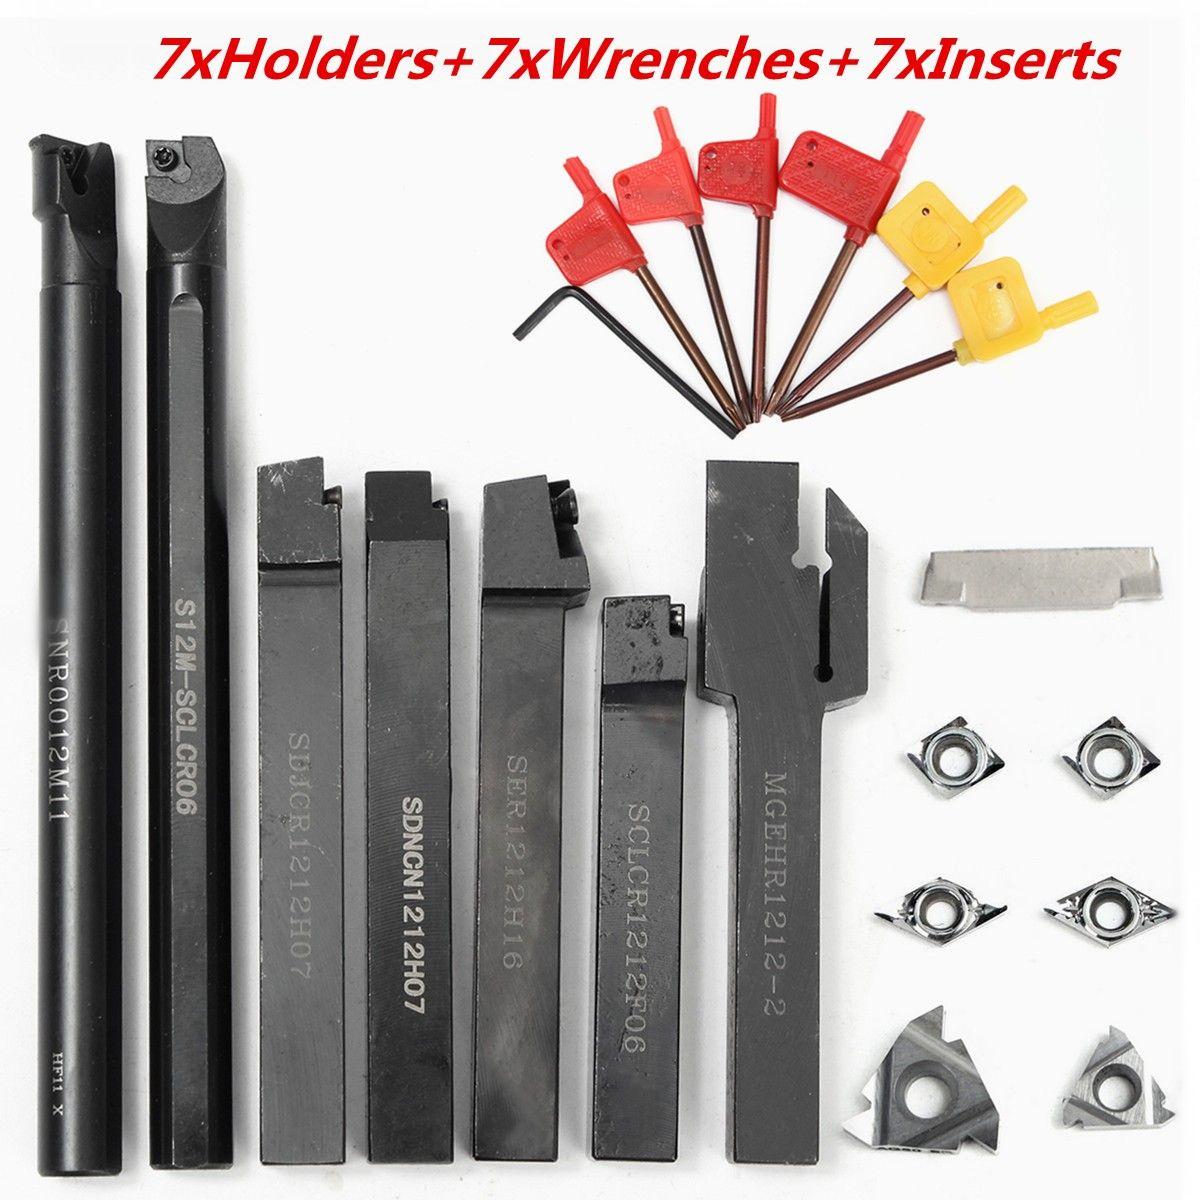 21Pcs/Set 12mm Shank Lathe Turning Tool Holder Boring Bar+ DCMT CCMT Carbide Insert + Wrench